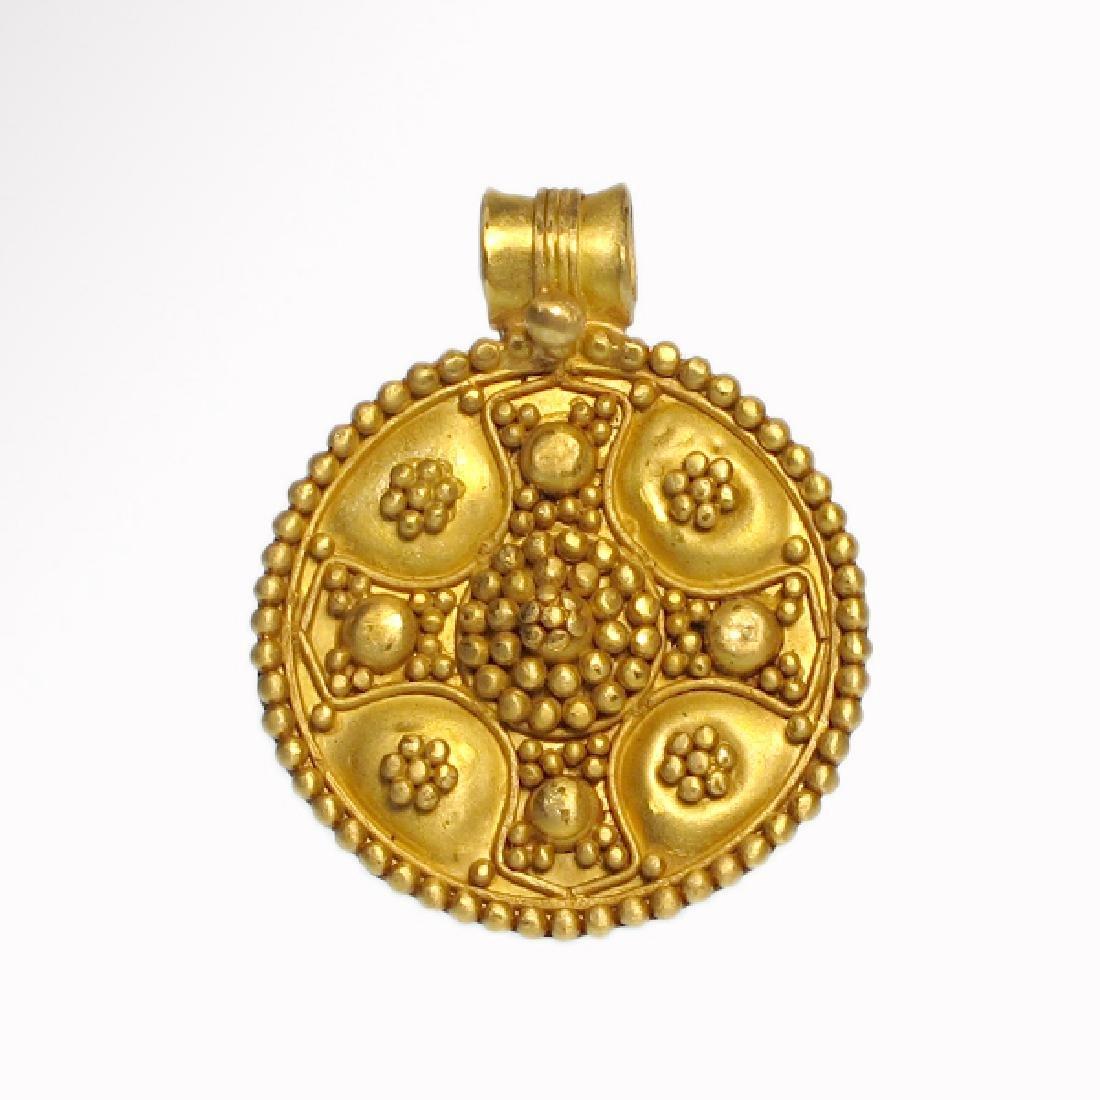 Byzantine Gold Cross Pendant, c. 8th-10th Century A.D.